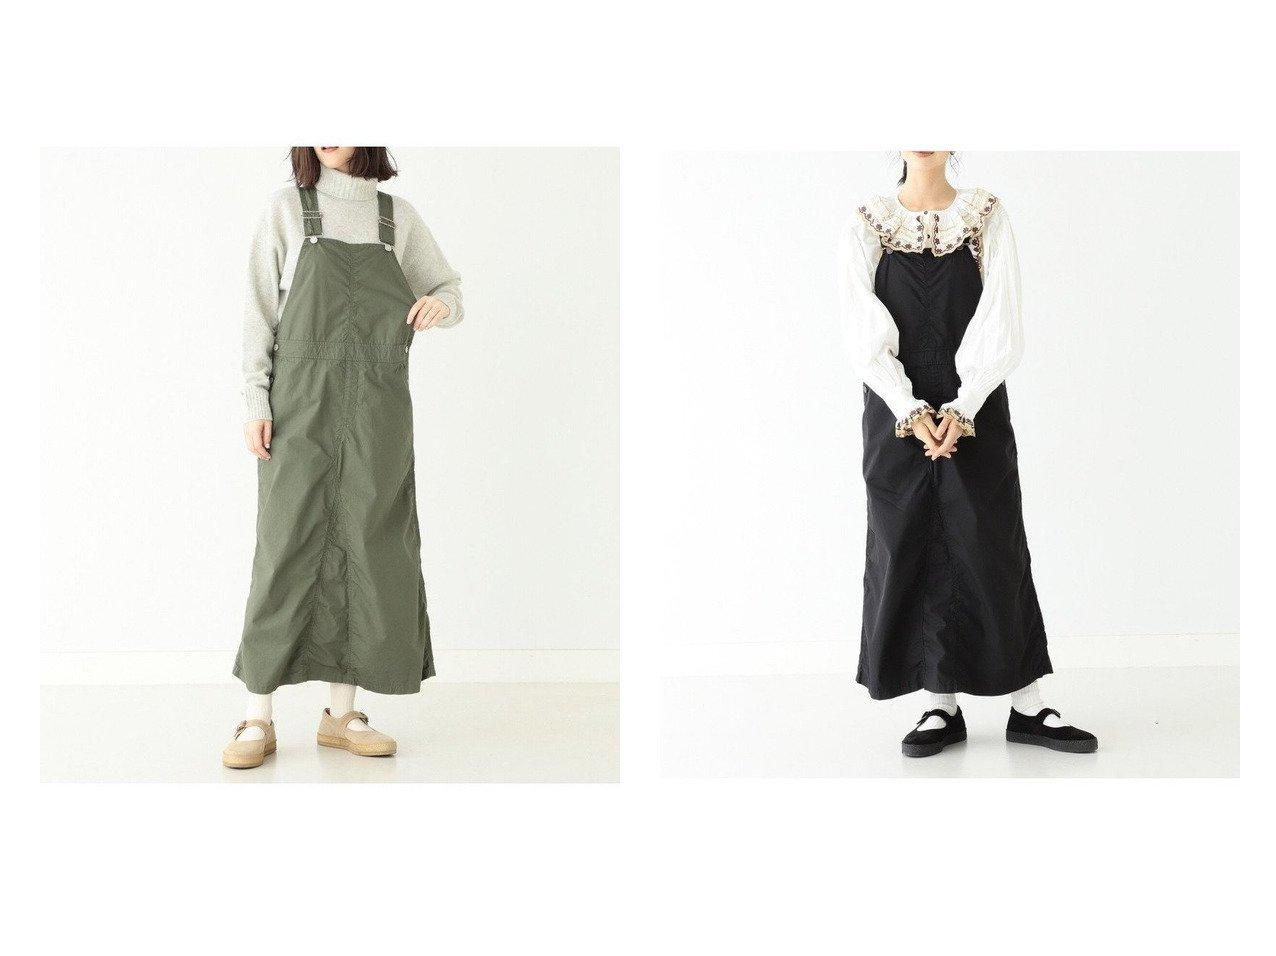 【BEAMS BOY/ビームス ボーイ】のコットン ポプリン ジャンプスカート スカートのおすすめ!人気、トレンド・レディースファッションの通販 おすすめで人気の流行・トレンド、ファッションの通販商品 メンズファッション・キッズファッション・インテリア・家具・レディースファッション・服の通販 founy(ファニー) https://founy.com/ ファッション Fashion レディースファッション WOMEN スカート Skirt カットソー スウェット リメイク |ID:crp329100000013416